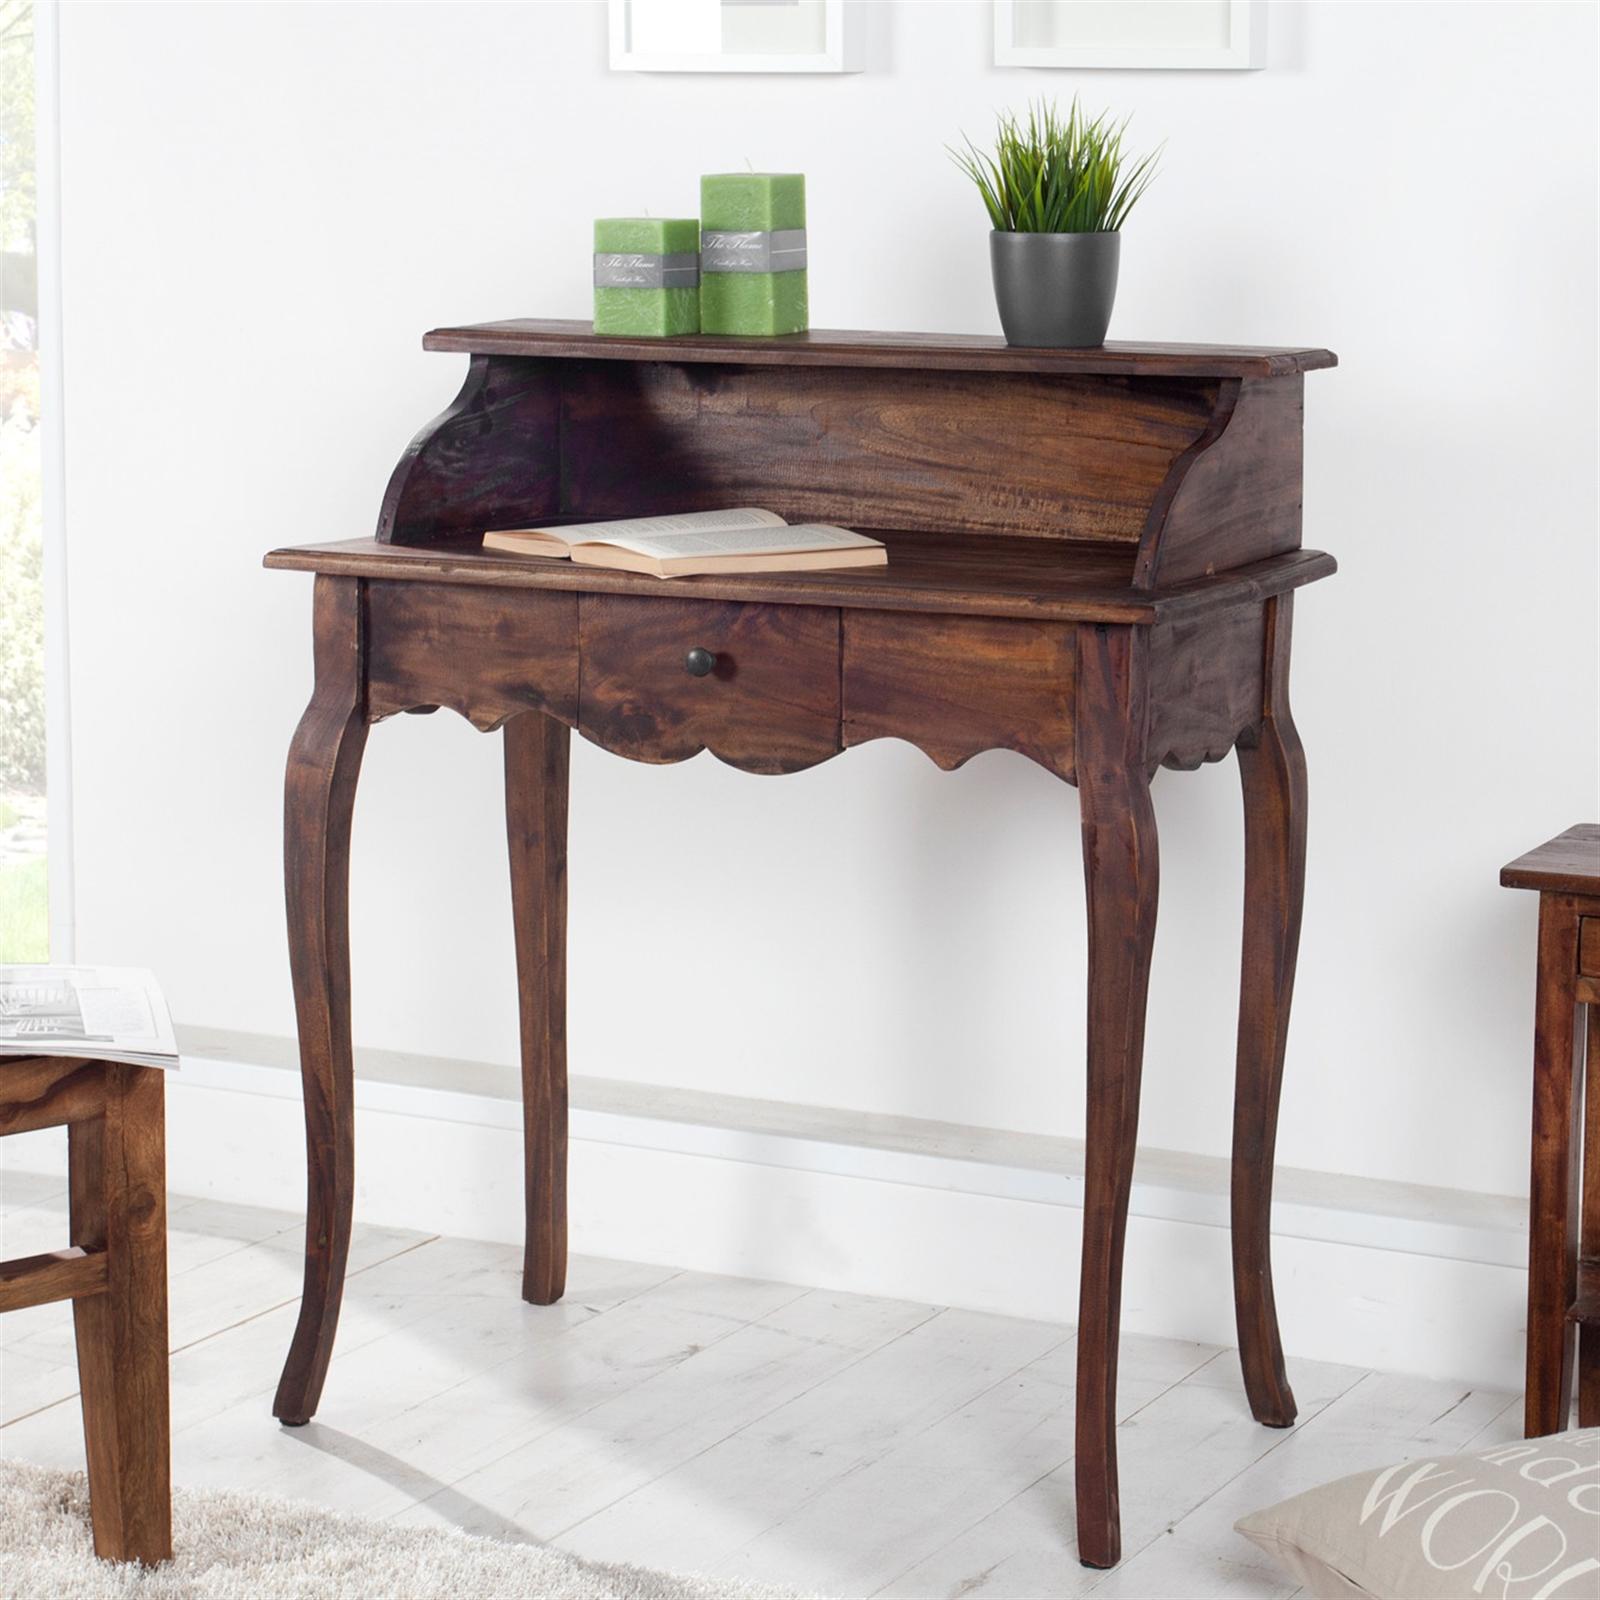 eleganter holz sekret r napoleon braun 80 cm mahagoni schreibtisch eur 199 00 picclick de. Black Bedroom Furniture Sets. Home Design Ideas